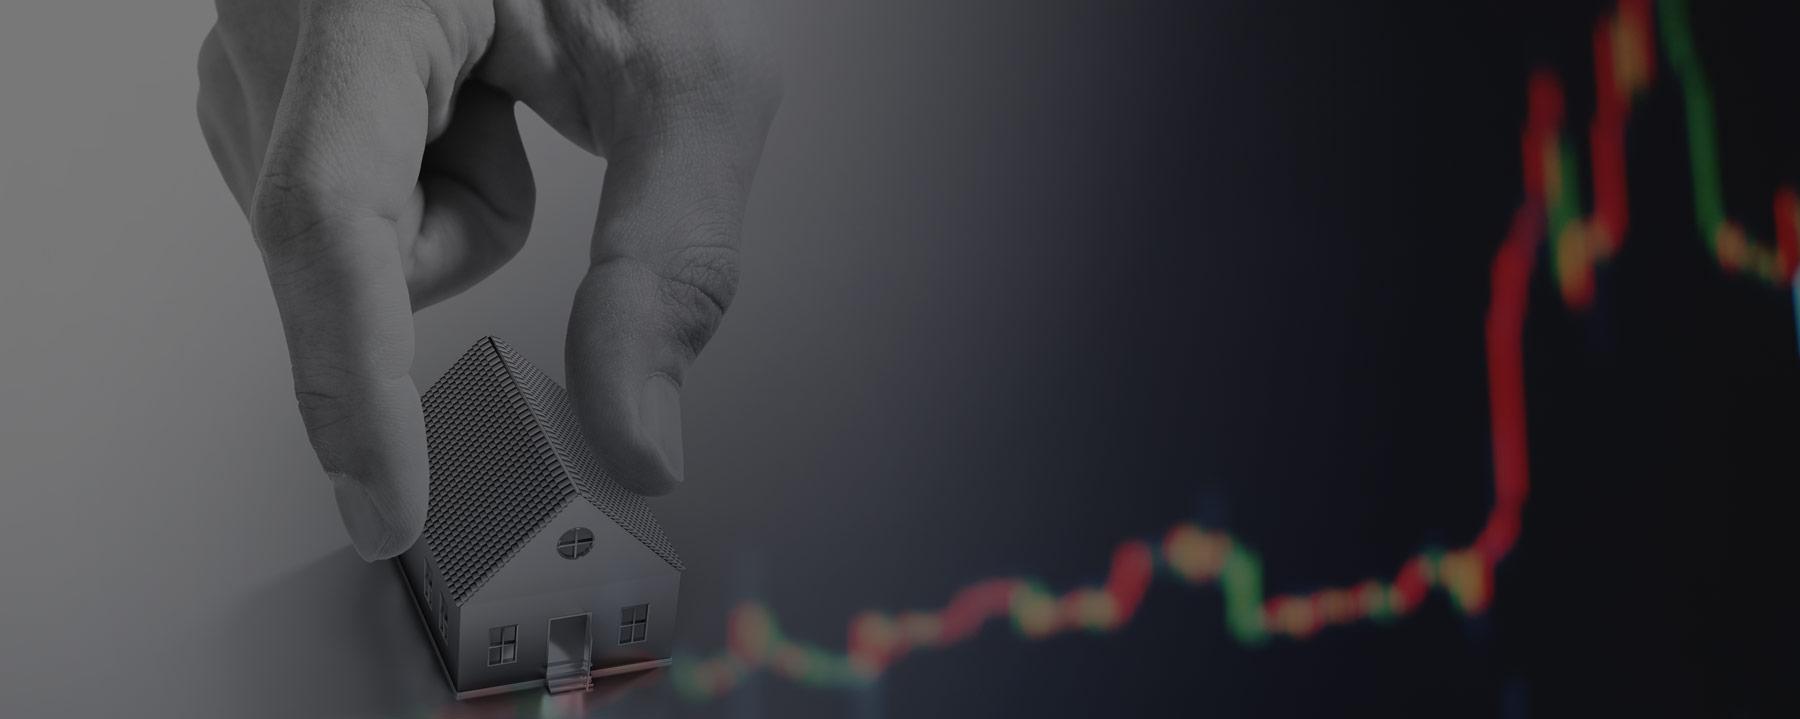 Investor properties from Nesco realty